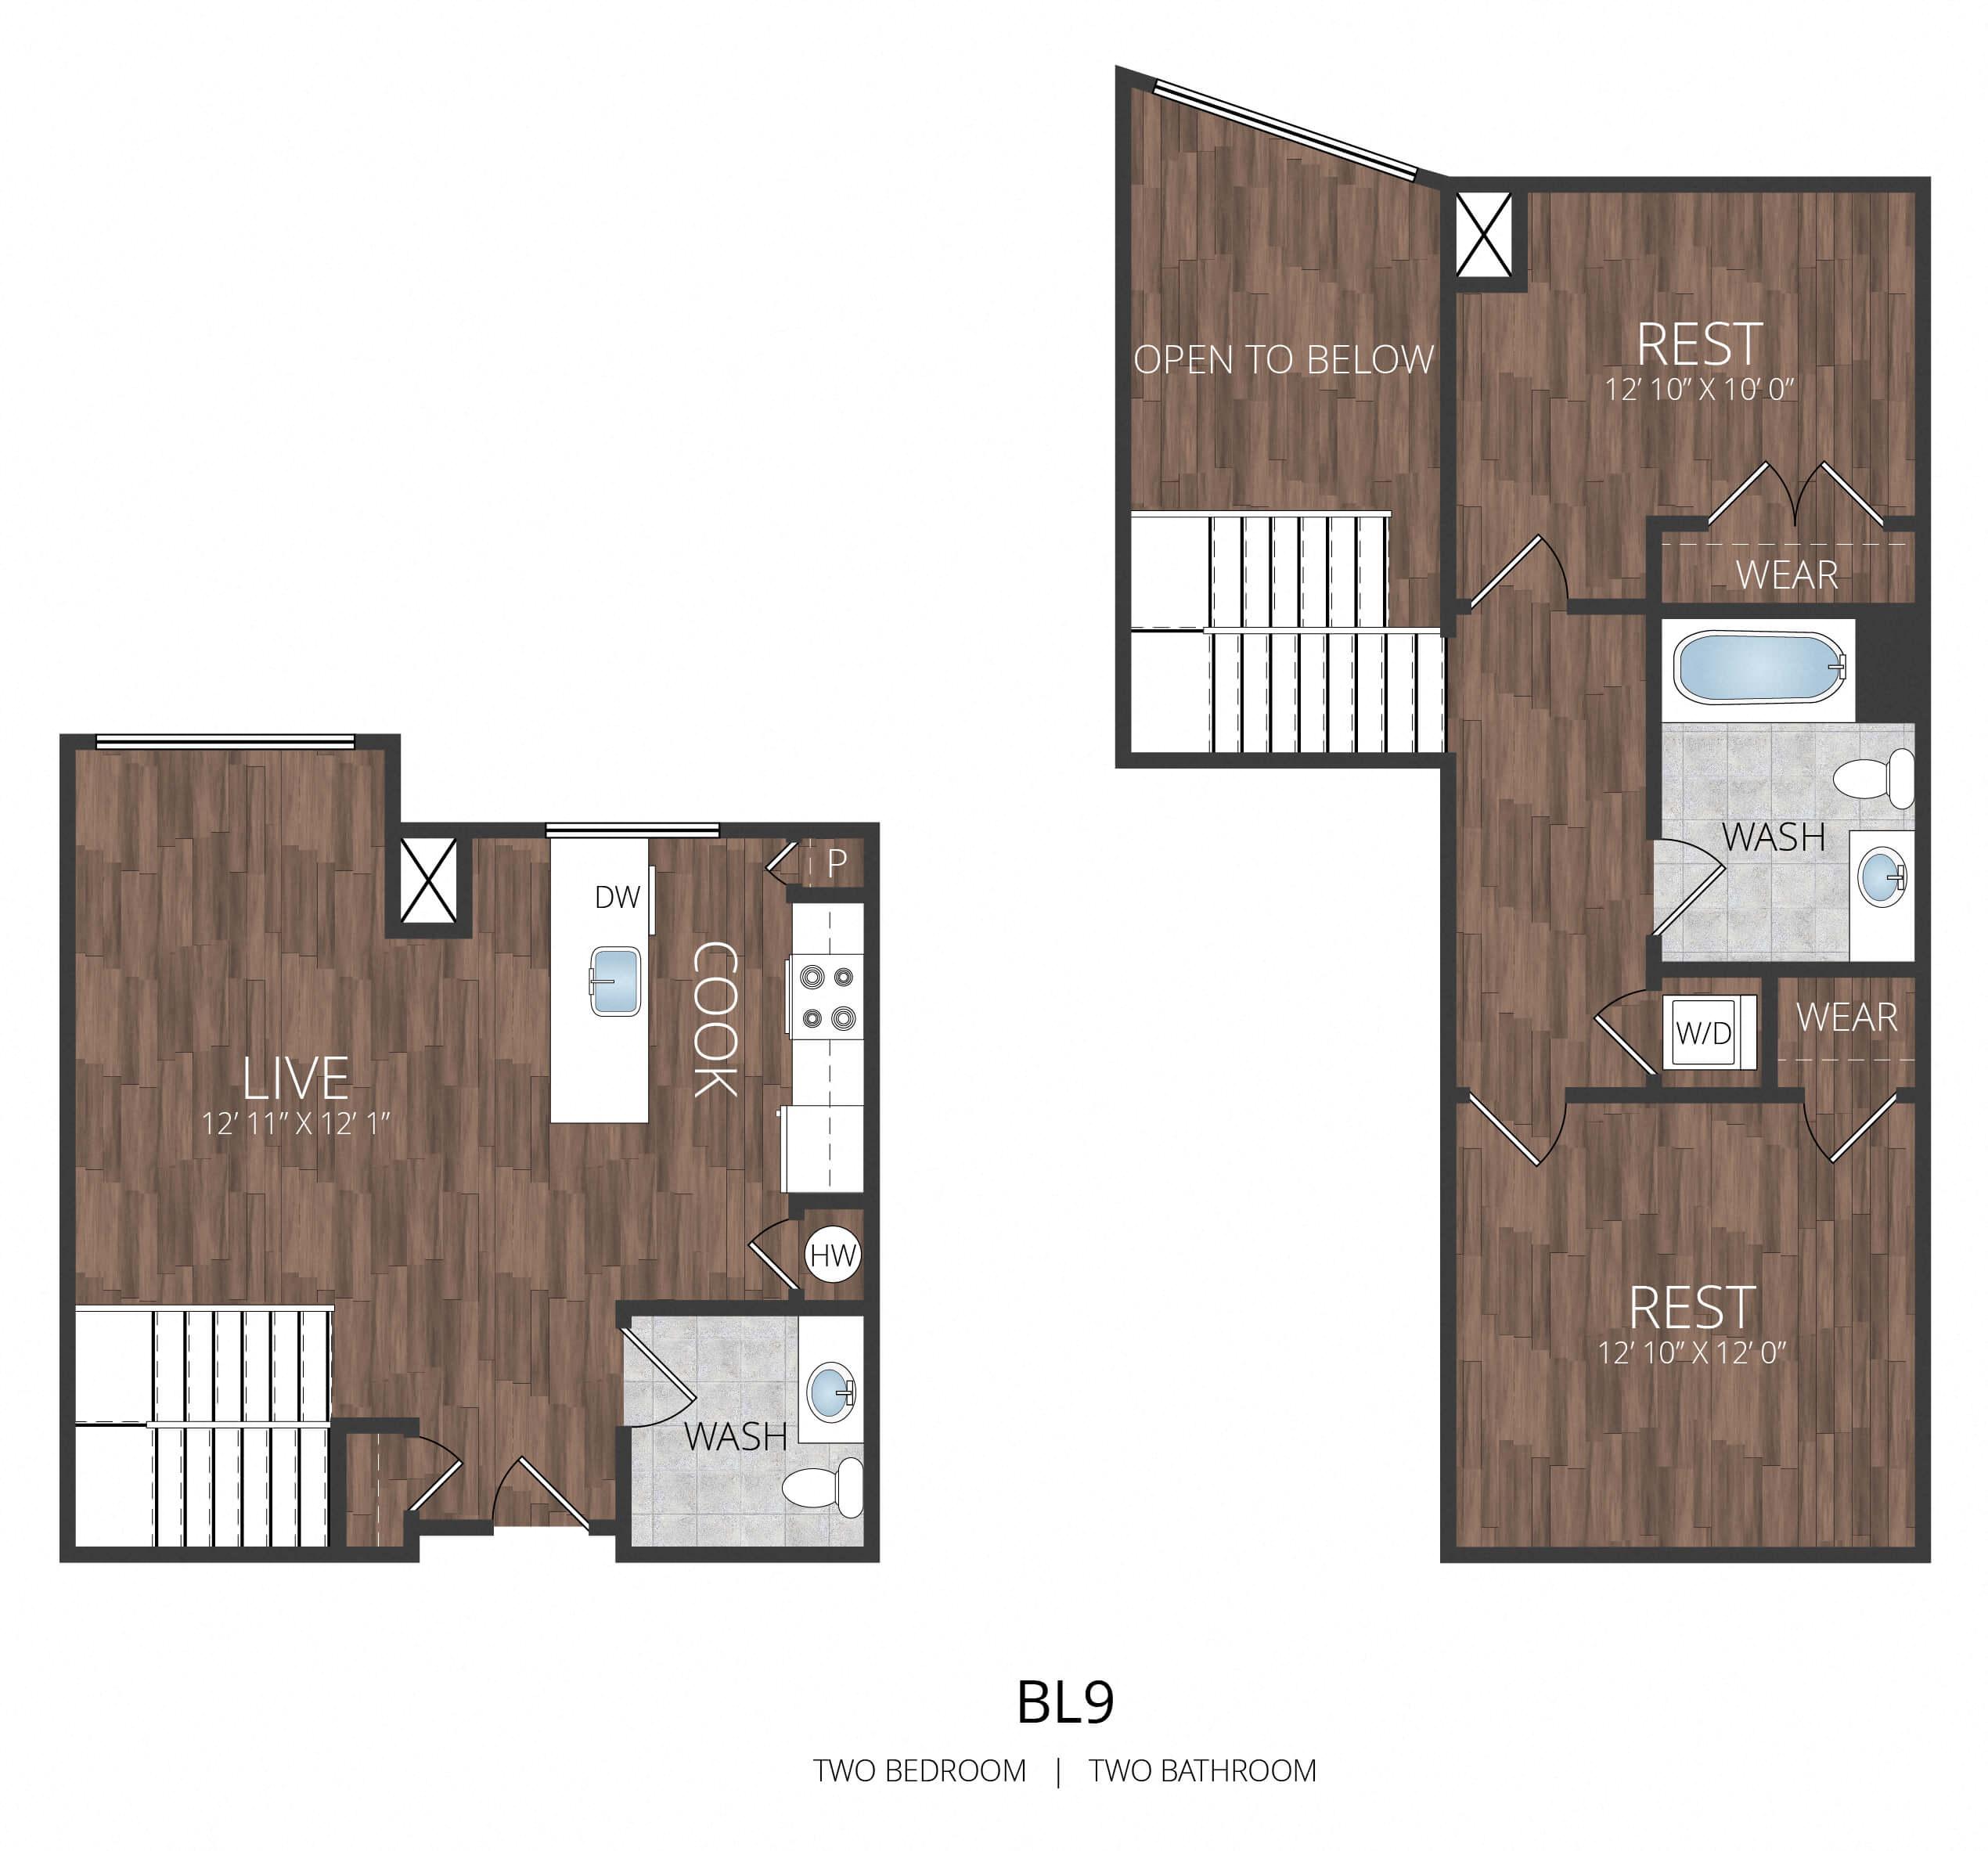 Penthouse BL9